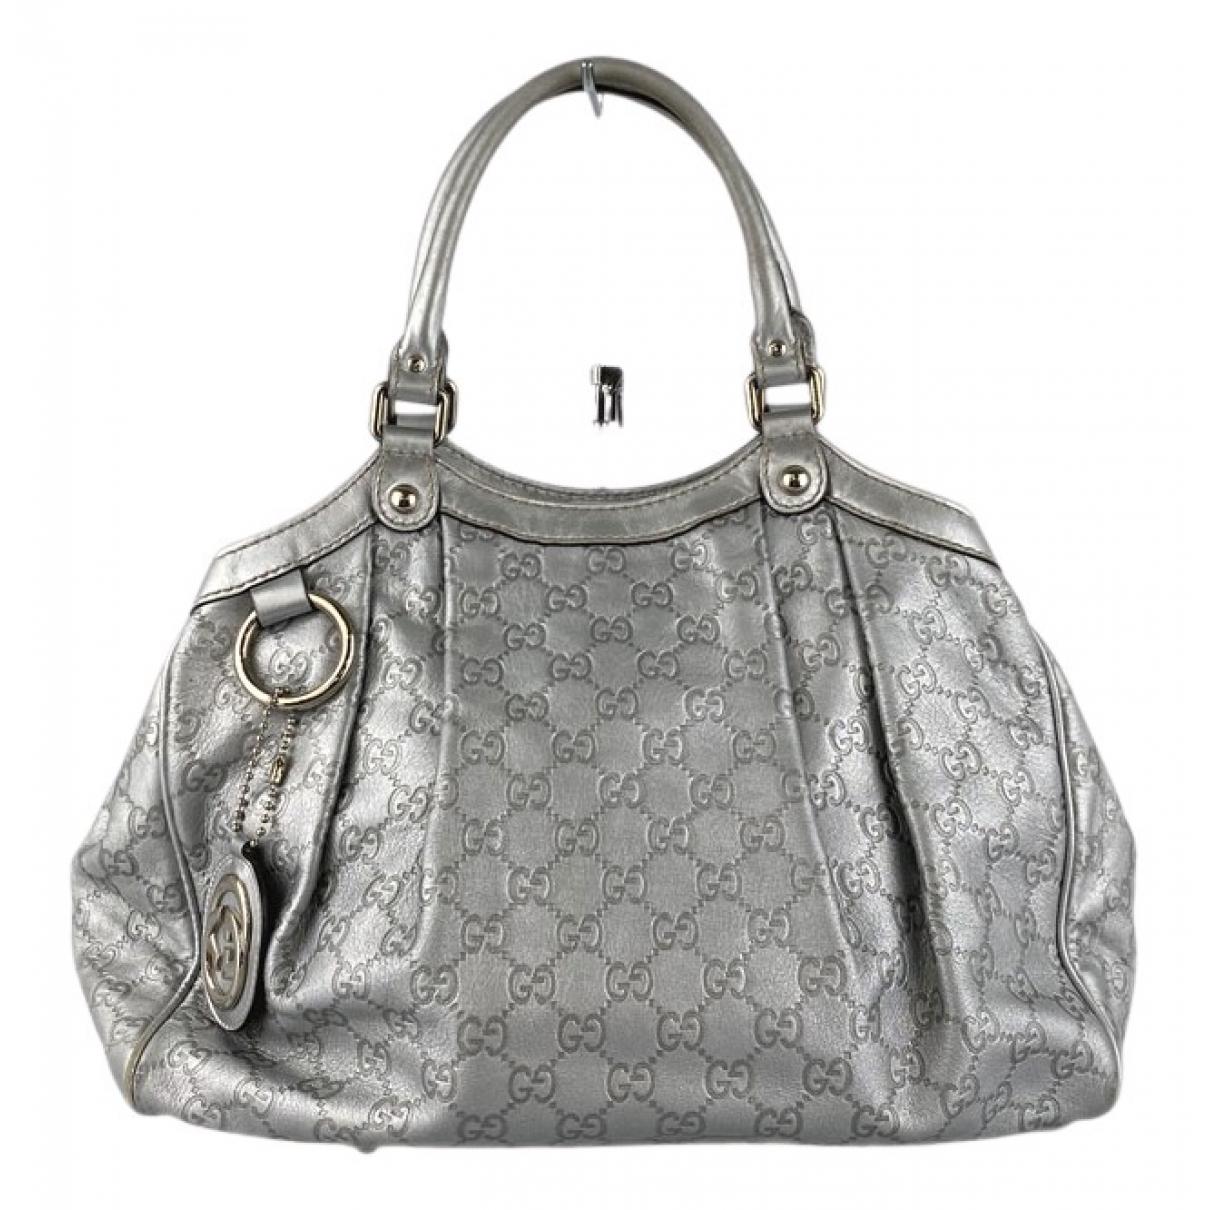 Gucci Sukey Silver Leather handbag for Women N